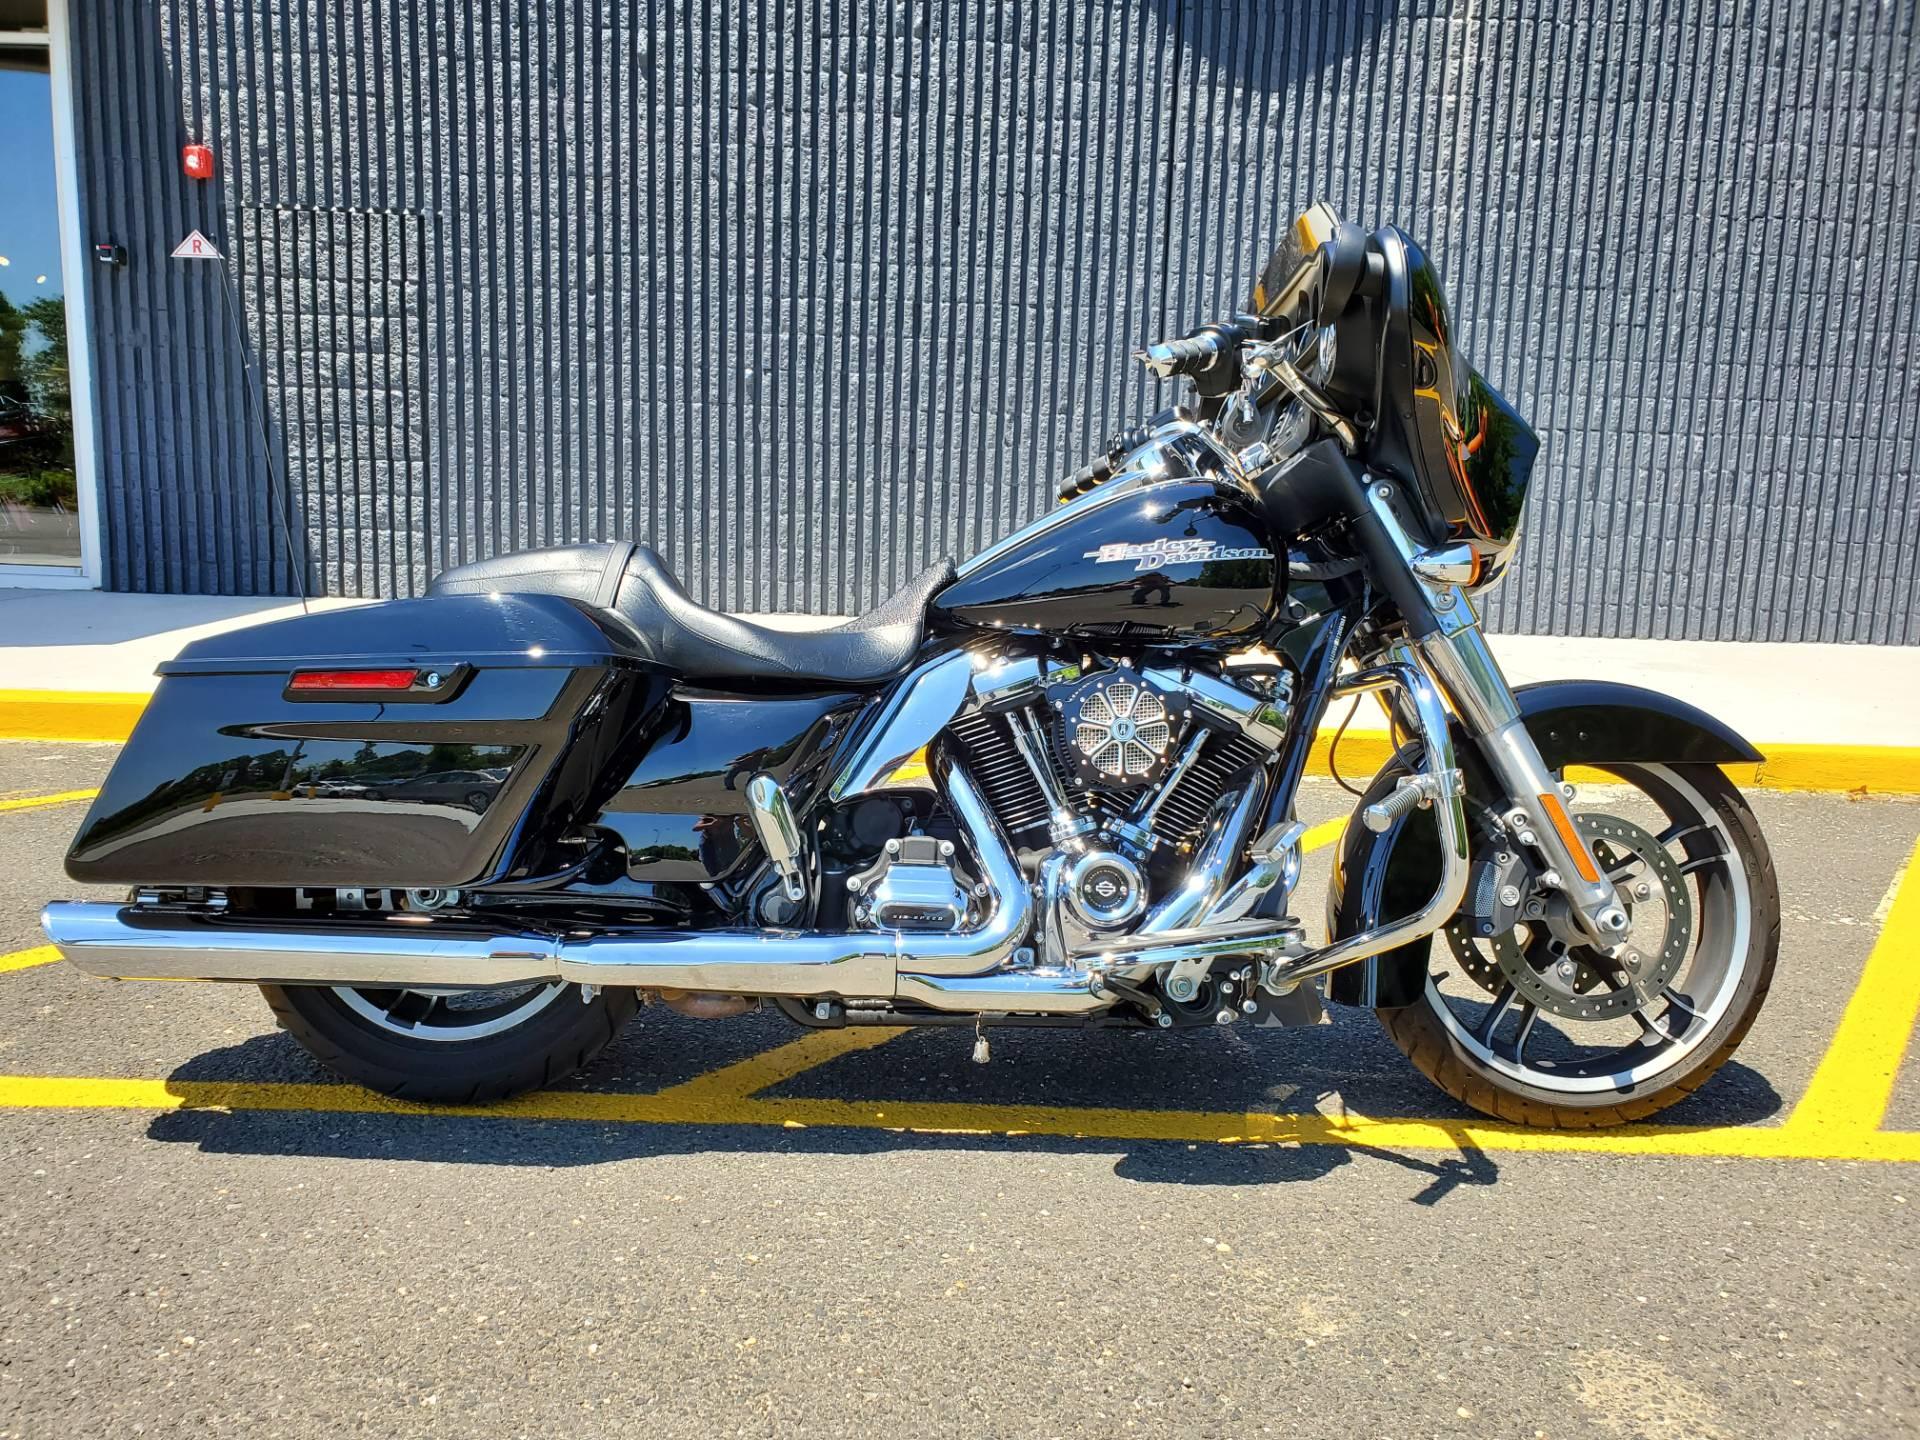 2017 Harley-Davidson Street Glide® in West Long Branch, New Jersey